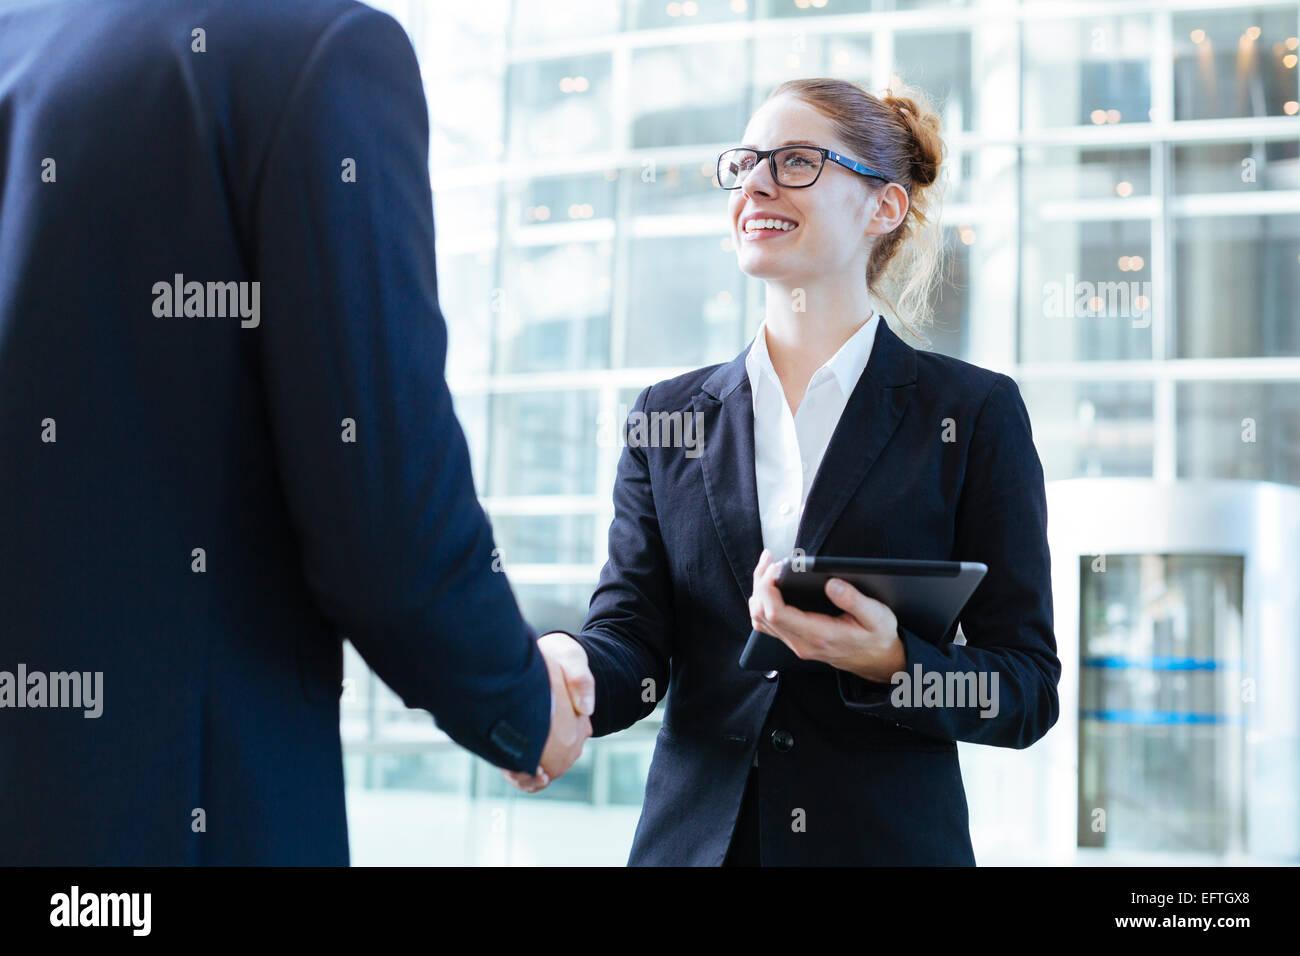 Reunión de gente de negocios Imagen De Stock